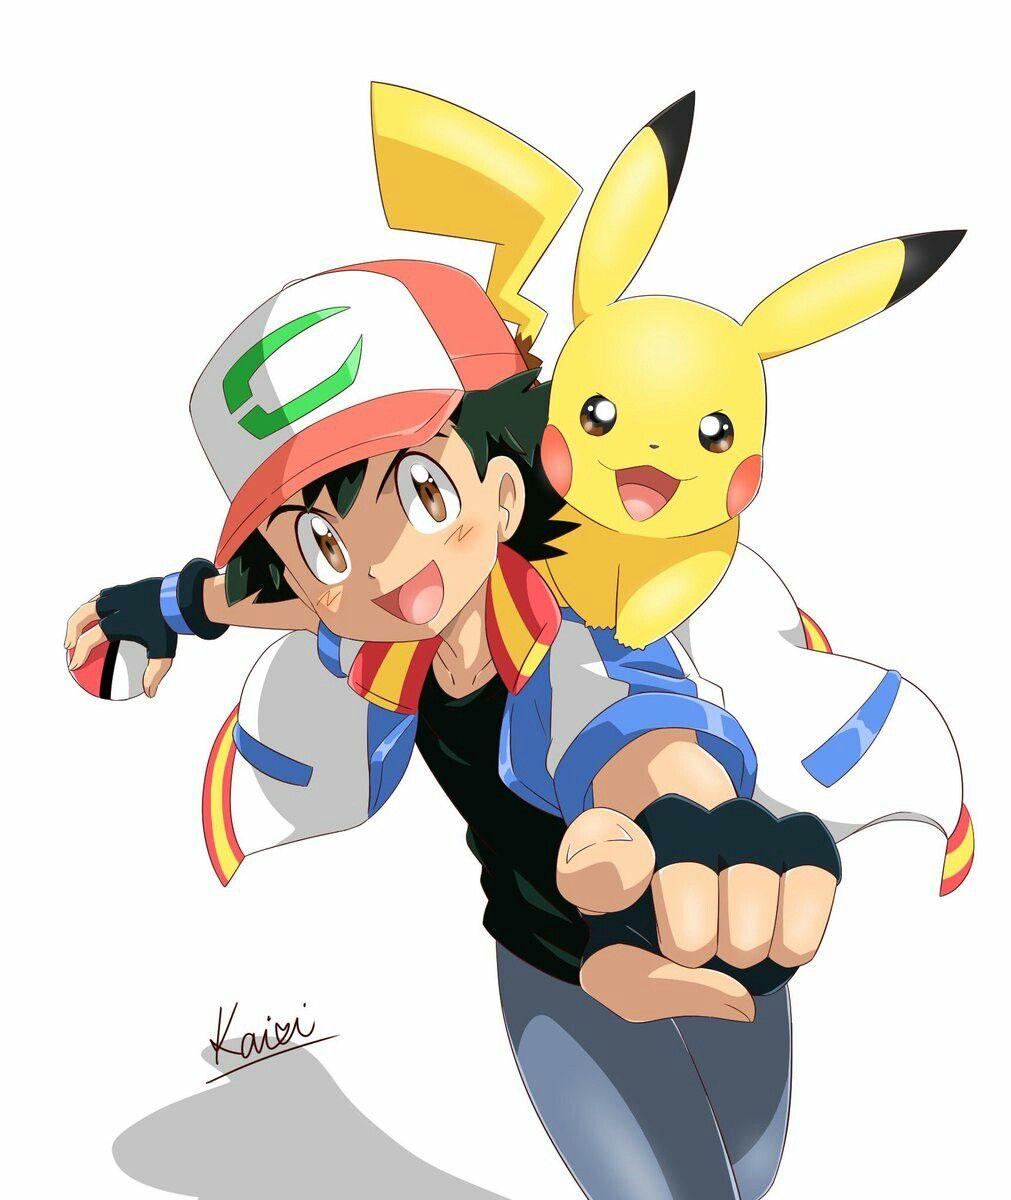 Ash And Pikachu The Movie 2018 Ash Pokemon Pokemon Cute Pokemon Wallpaper